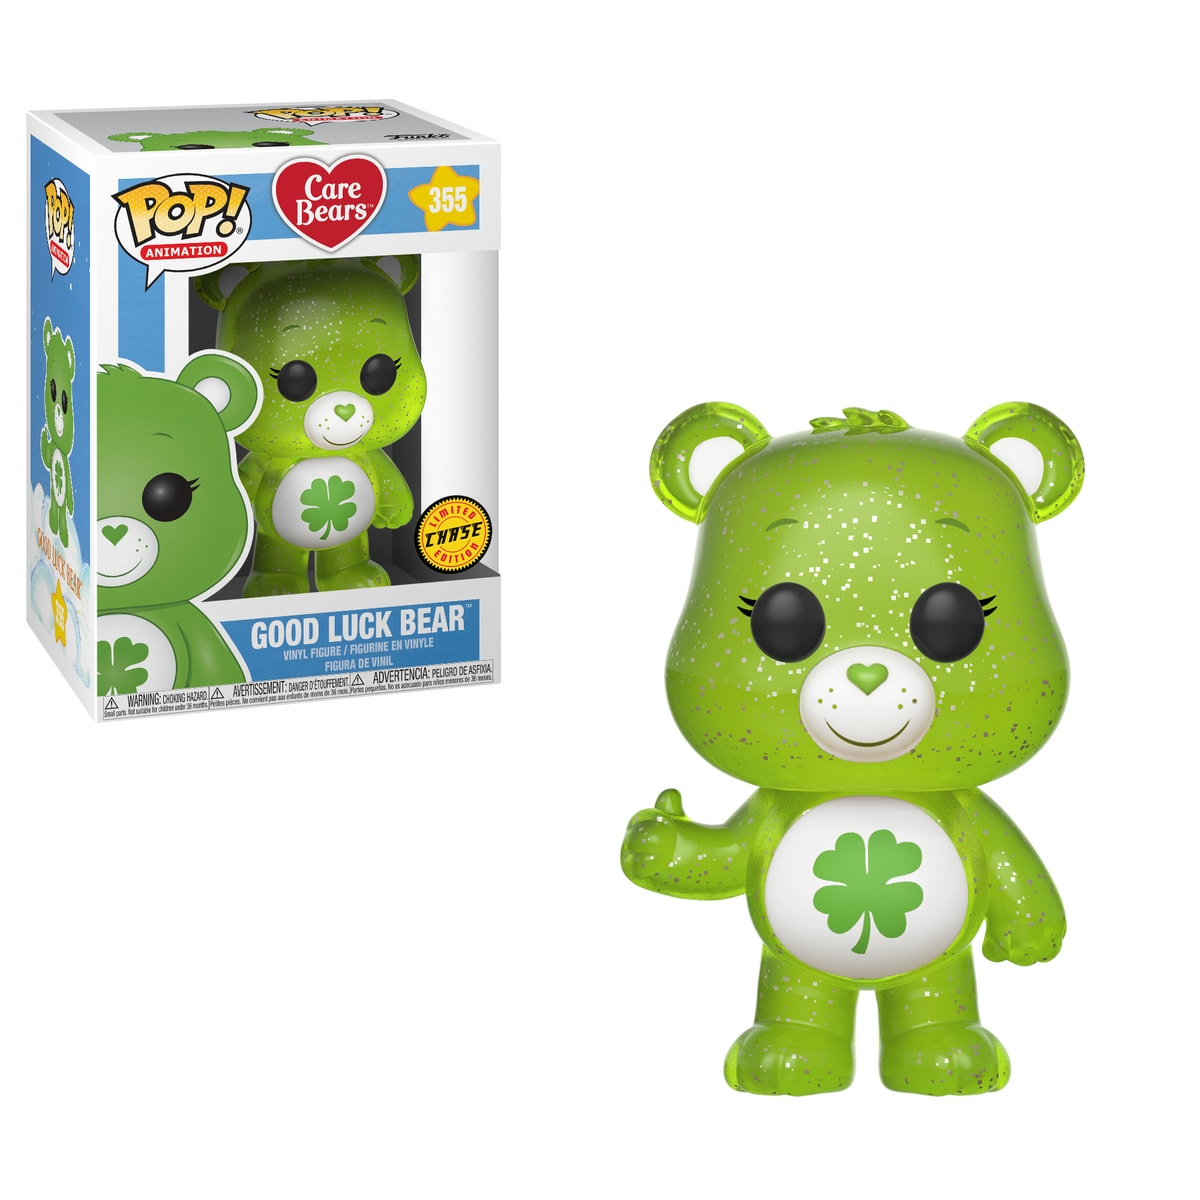 Funko POP: Care Bears - Good Luck Bear